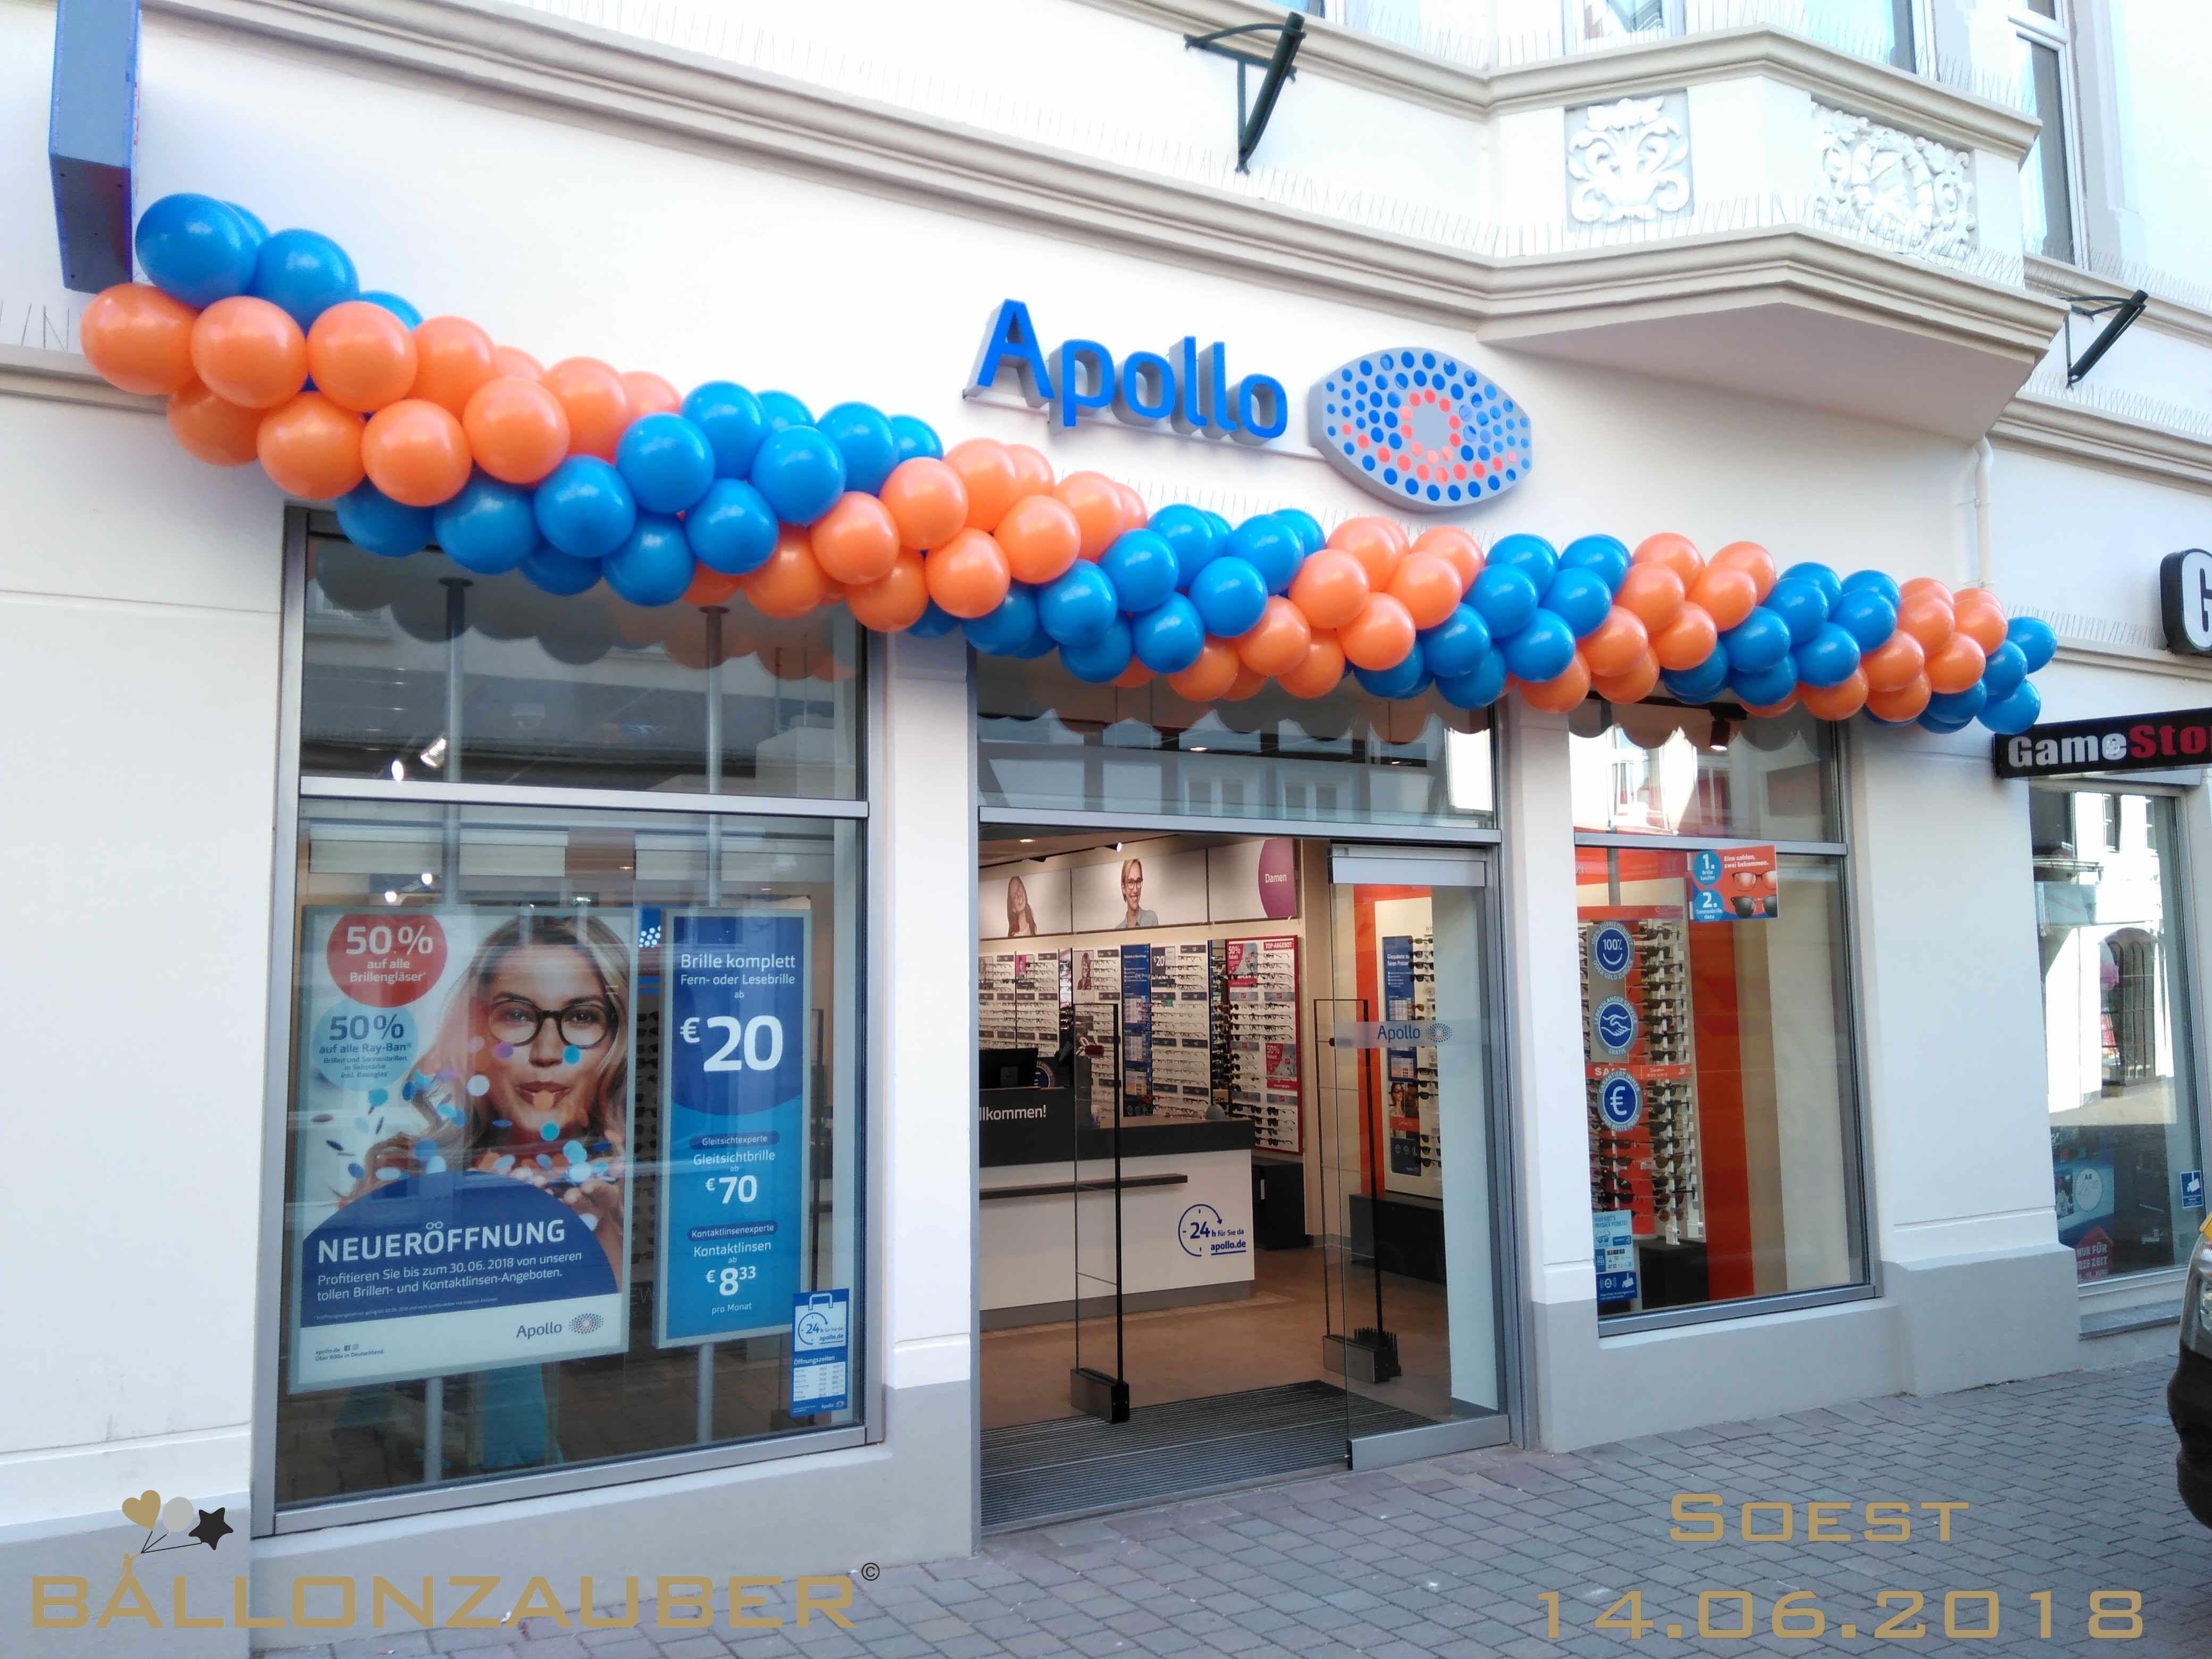 Ballongirlande In Orange Und Blau Fur Eine Apollo Filliale In Soest Ballonzauber Dortmund Ihr Partner Fur Ba Ballondekorationen Luftballons Ballongirlande